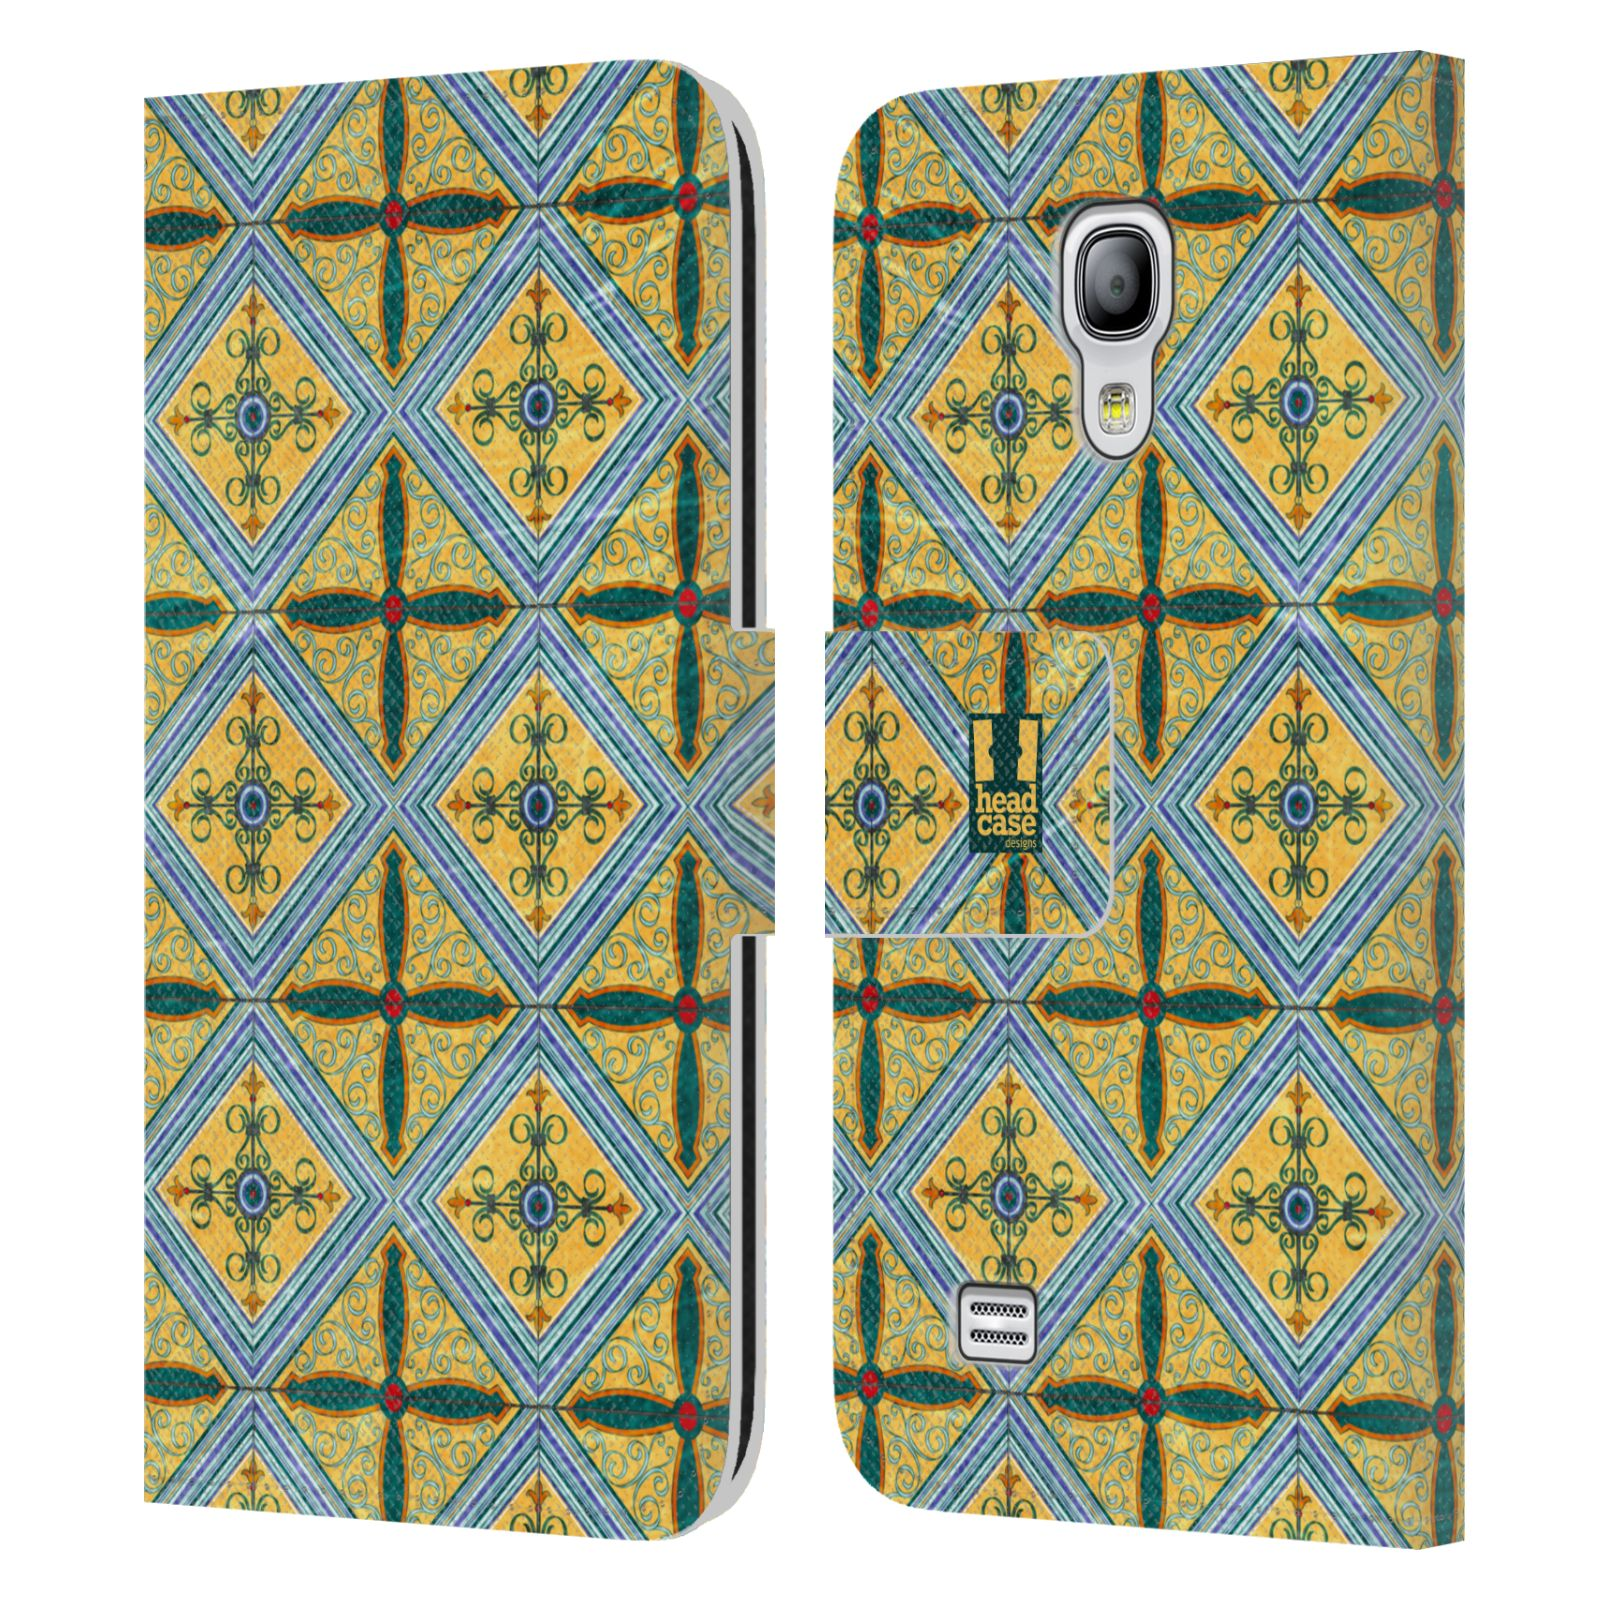 HEAD CASE Flipové pouzdro pro mobil Samsung Galaxy S4 MINI / S4 MINI DUOS ARABESKA CERAMIC žlutá